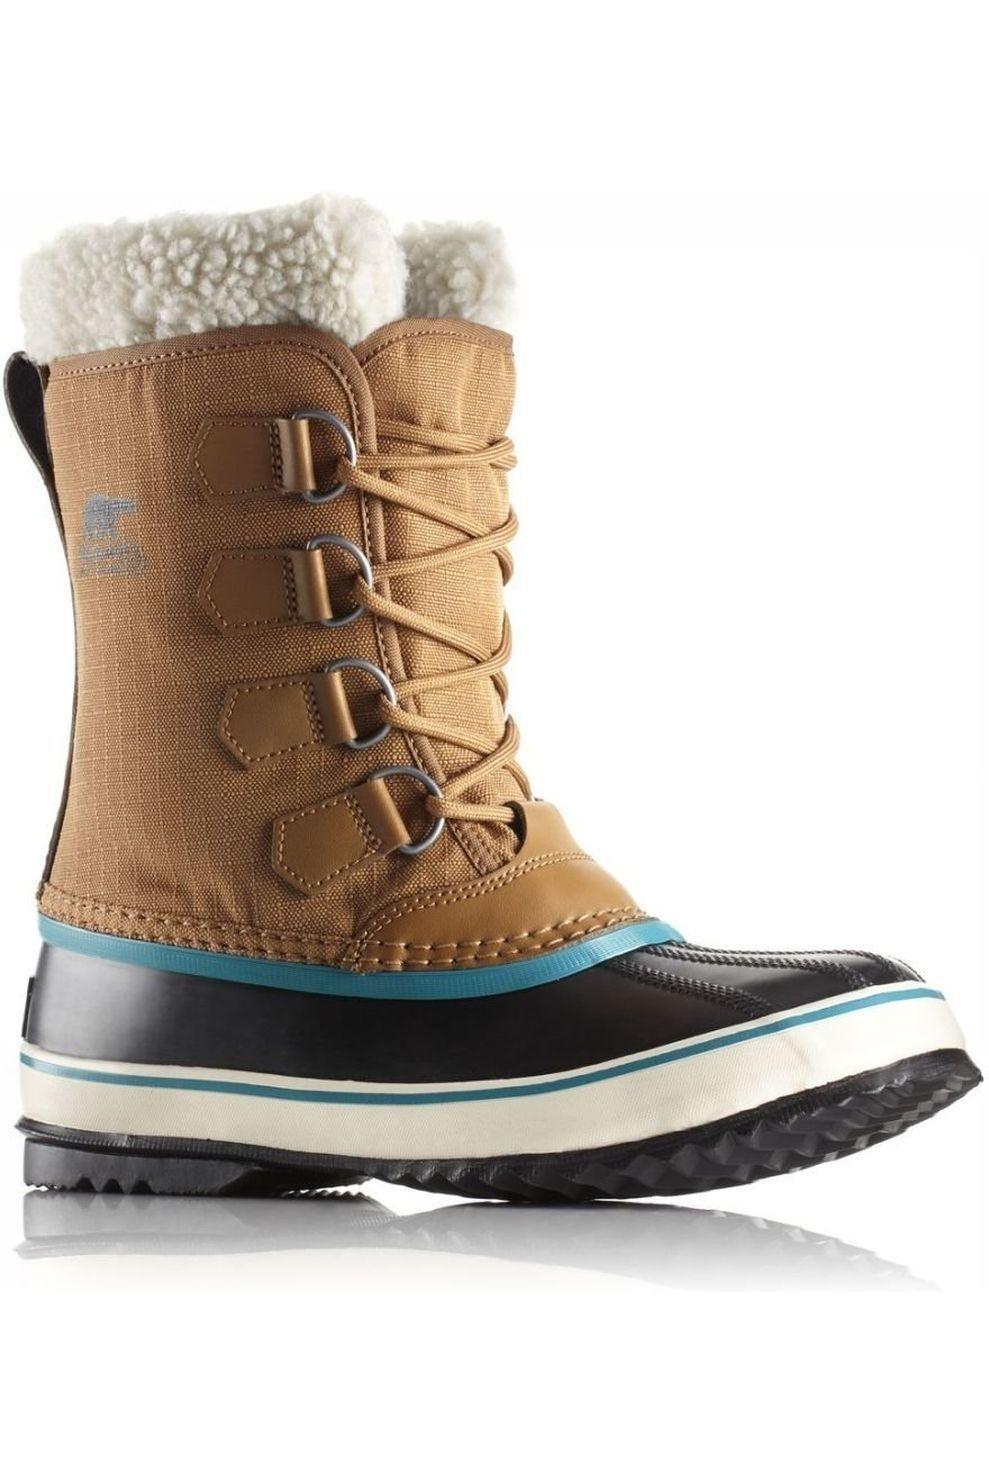 Sorel Après-Ski Laars Winter Carnival voor dames - Bruin - Maat: 5.5